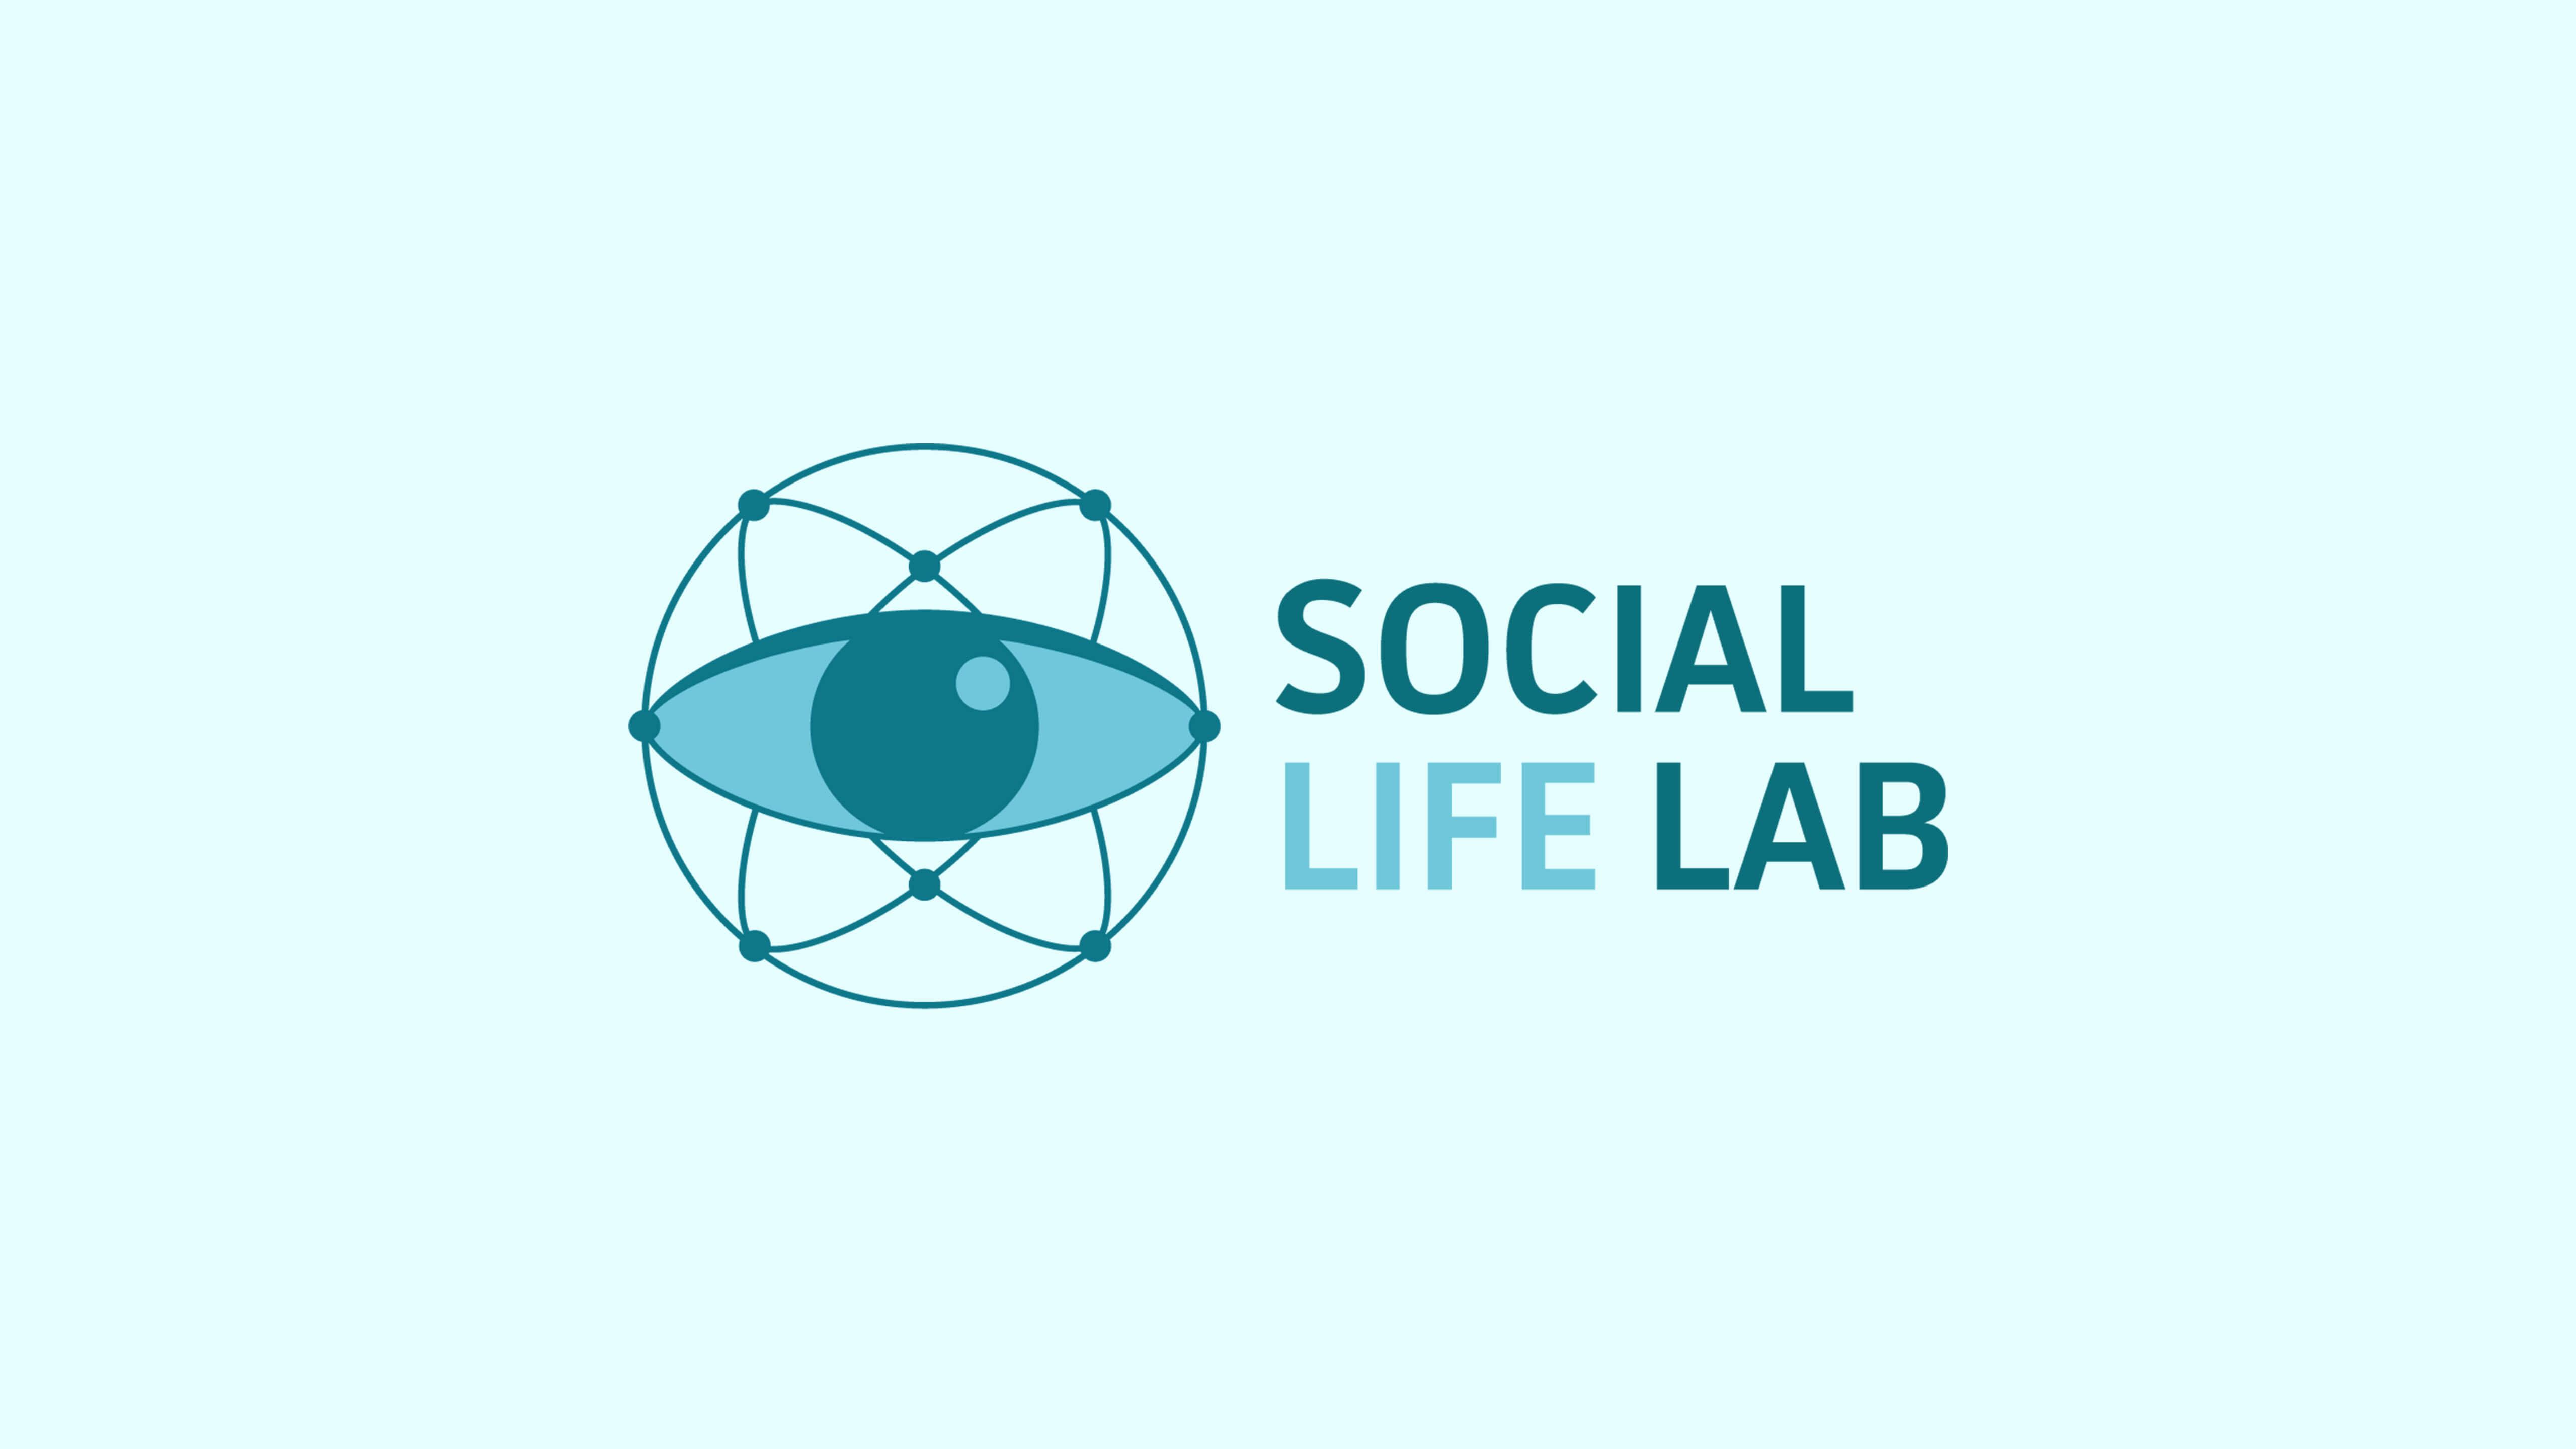 Social Life LAB, logo, Mixus studio